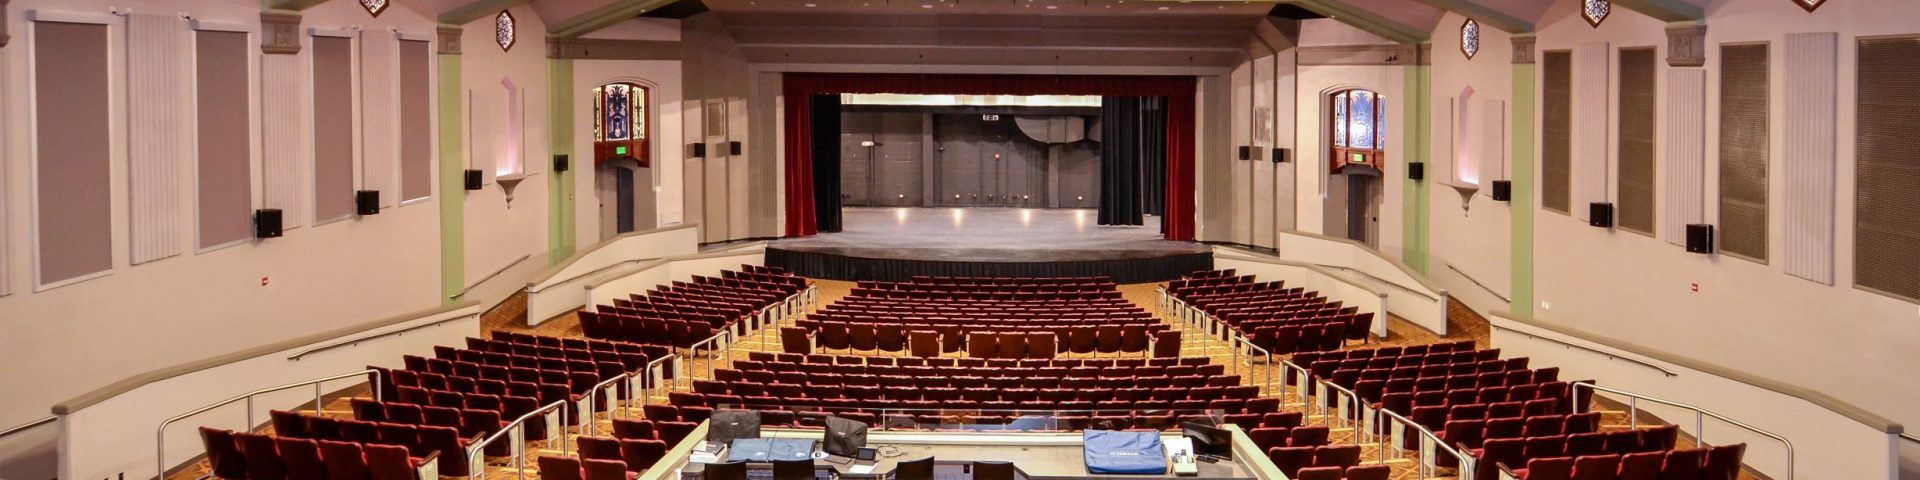 Degenkolb C K  McClatchy High School, Performing Arts